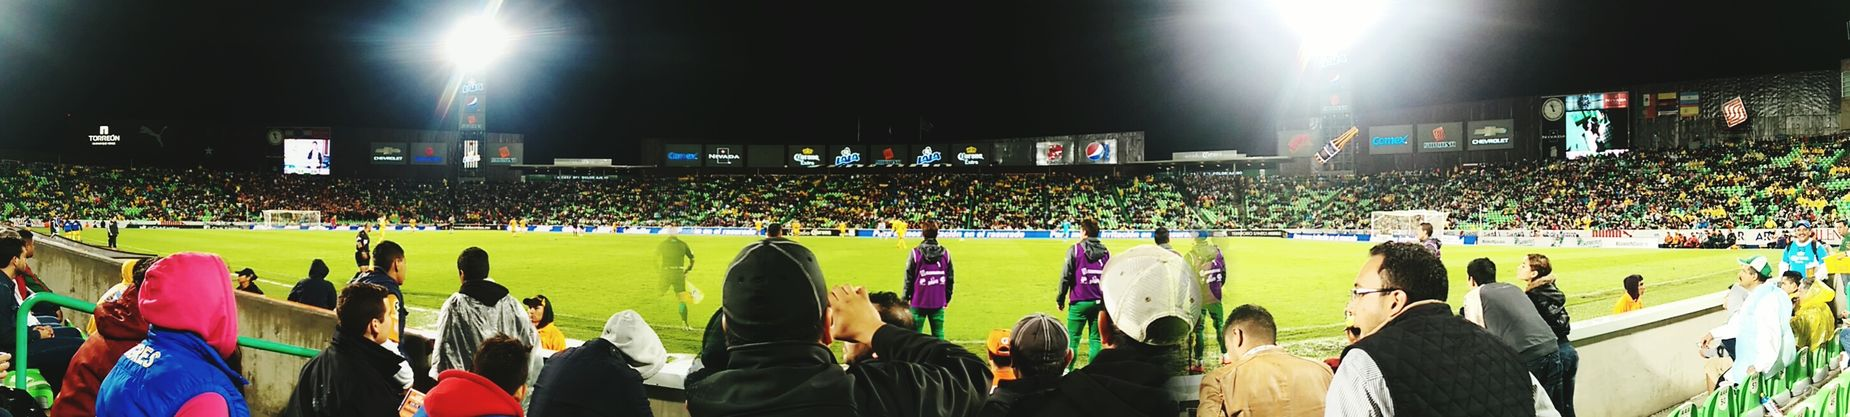 Gran estado, gran afición, gran equipo... Santos Laguna Csl Futbol